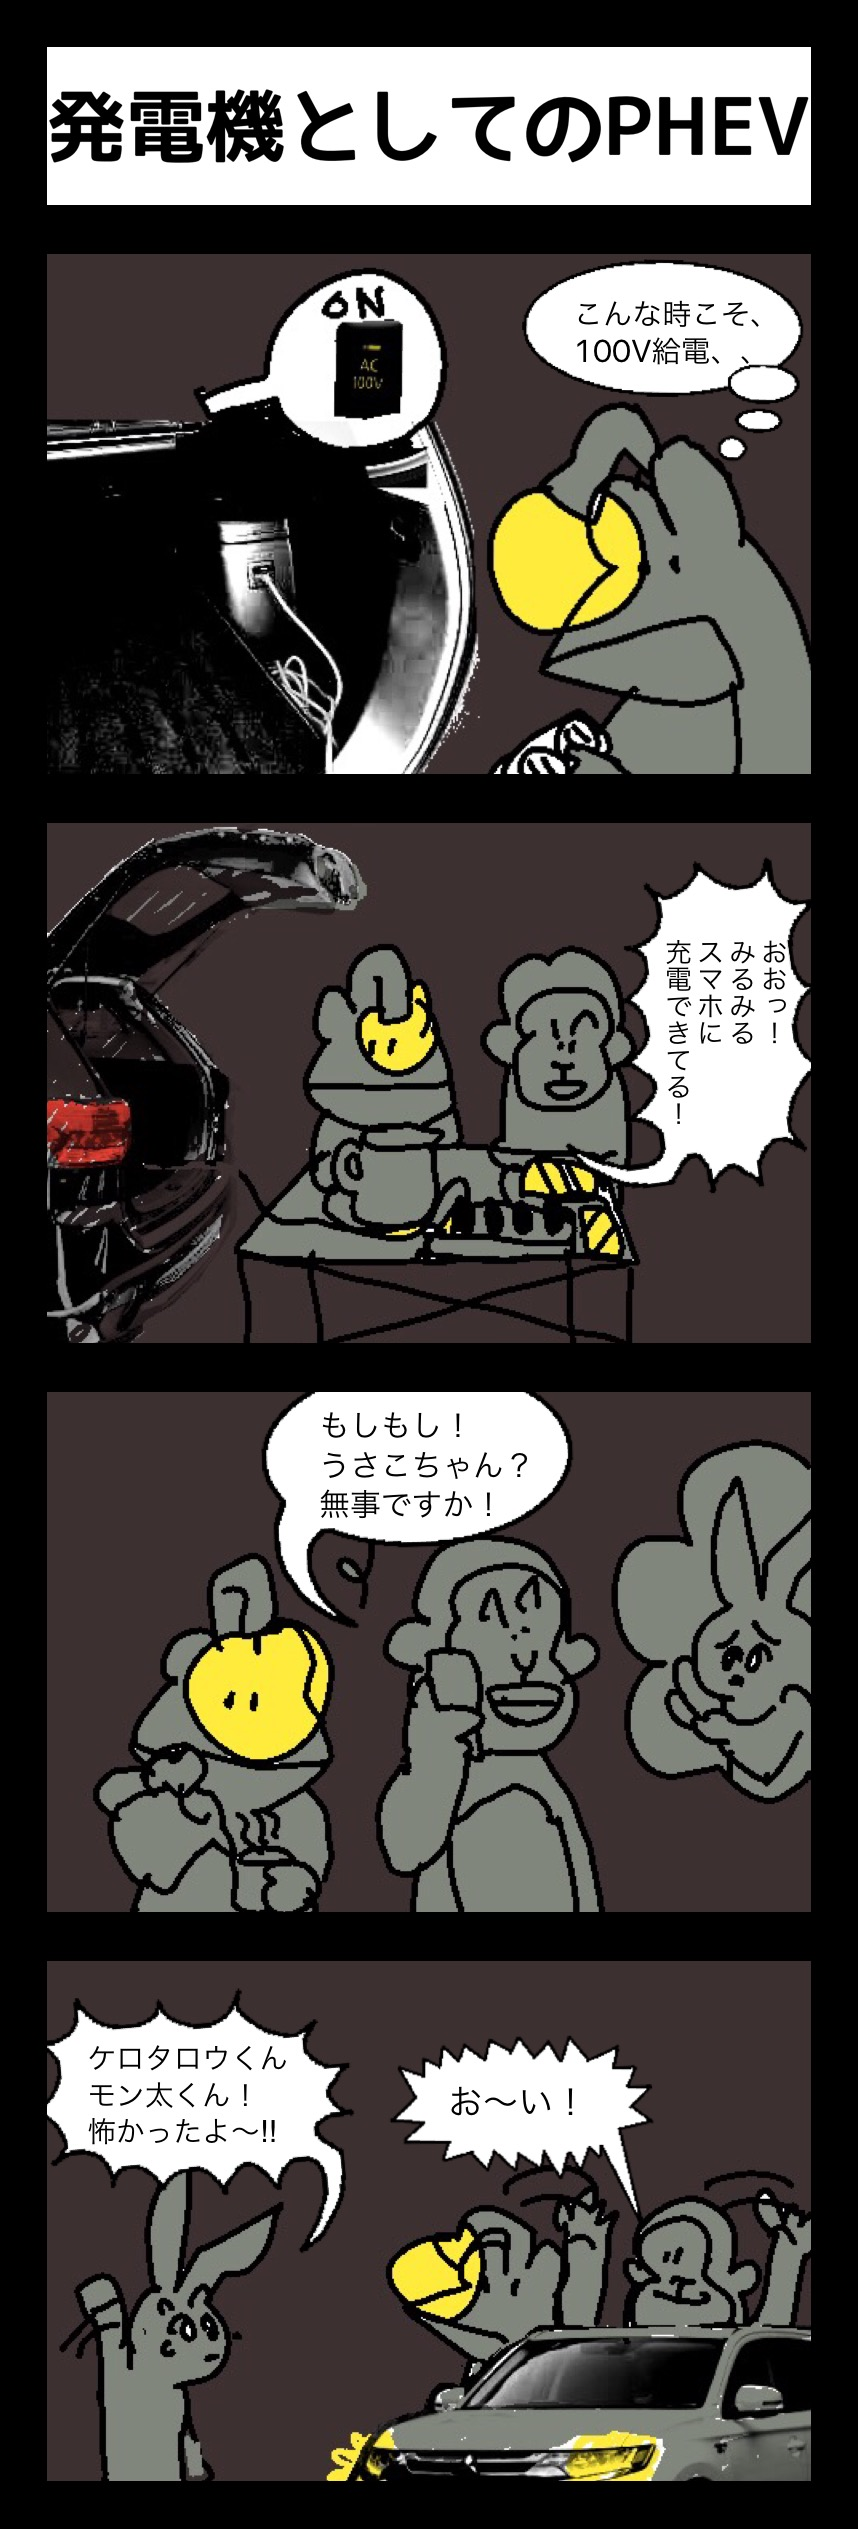 PHEV鳥獣戯画 その43「発電機としてのPHEV」